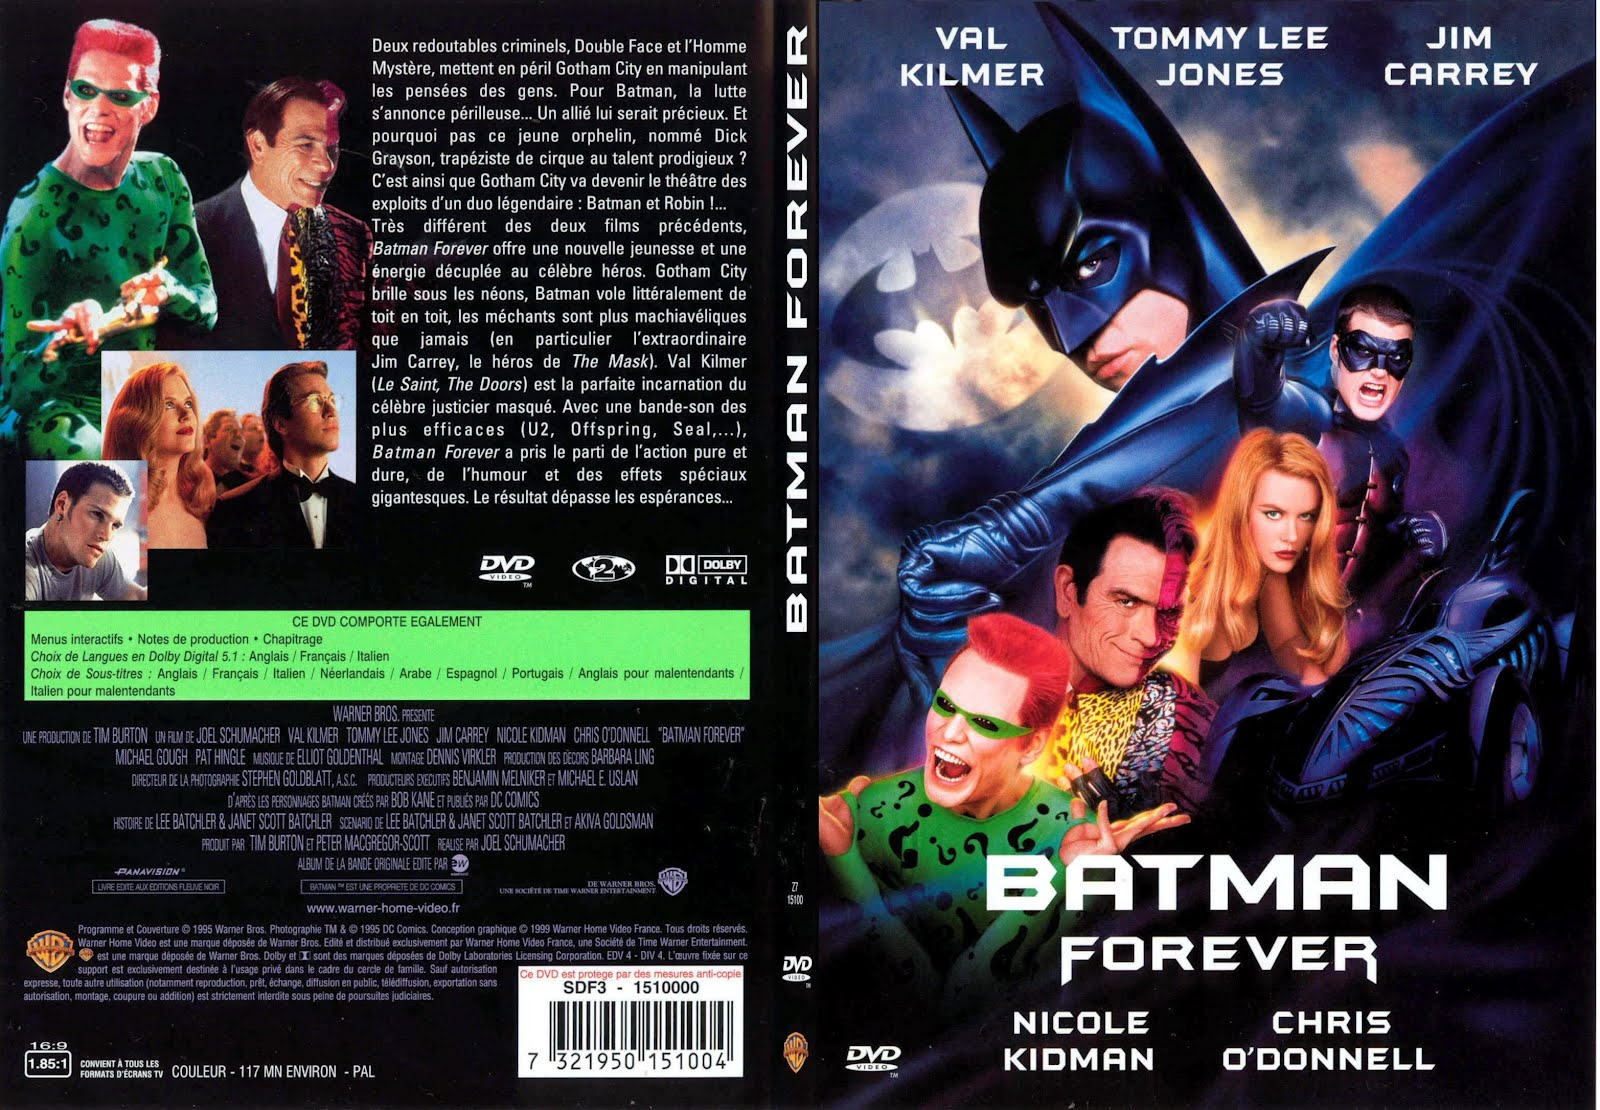 http://4.bp.blogspot.com/-9Q1L0oCEqFw/T-HgCc8fFTI/AAAAAAAAAyY/OkUOfKeIXEg/s1600/Batman%2BForever%2BDVD.jpg